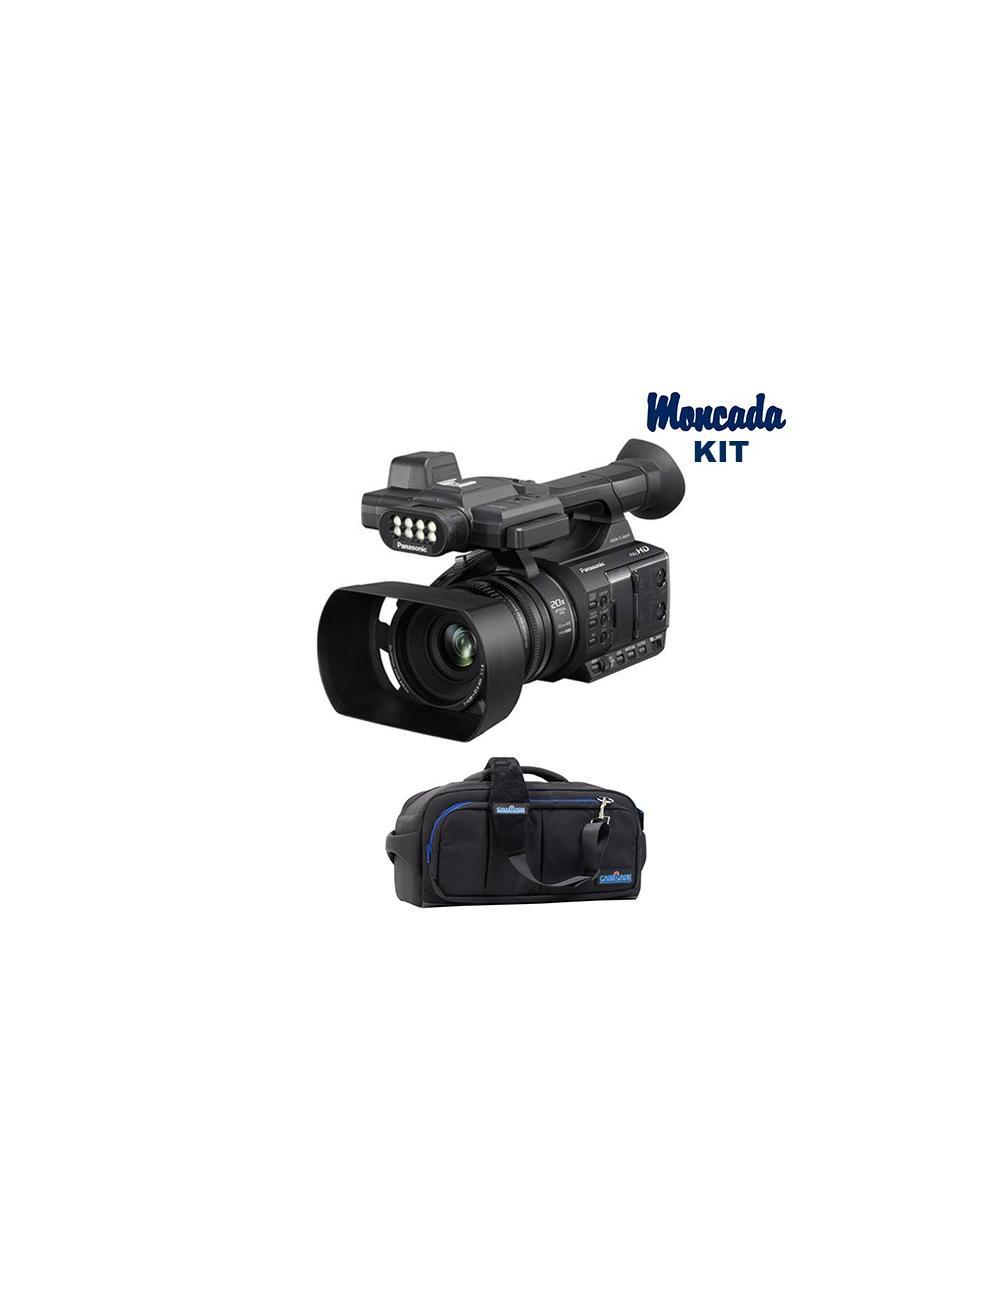 Panasonic AG-AC30 + camrade run&gunBag Medium Kit